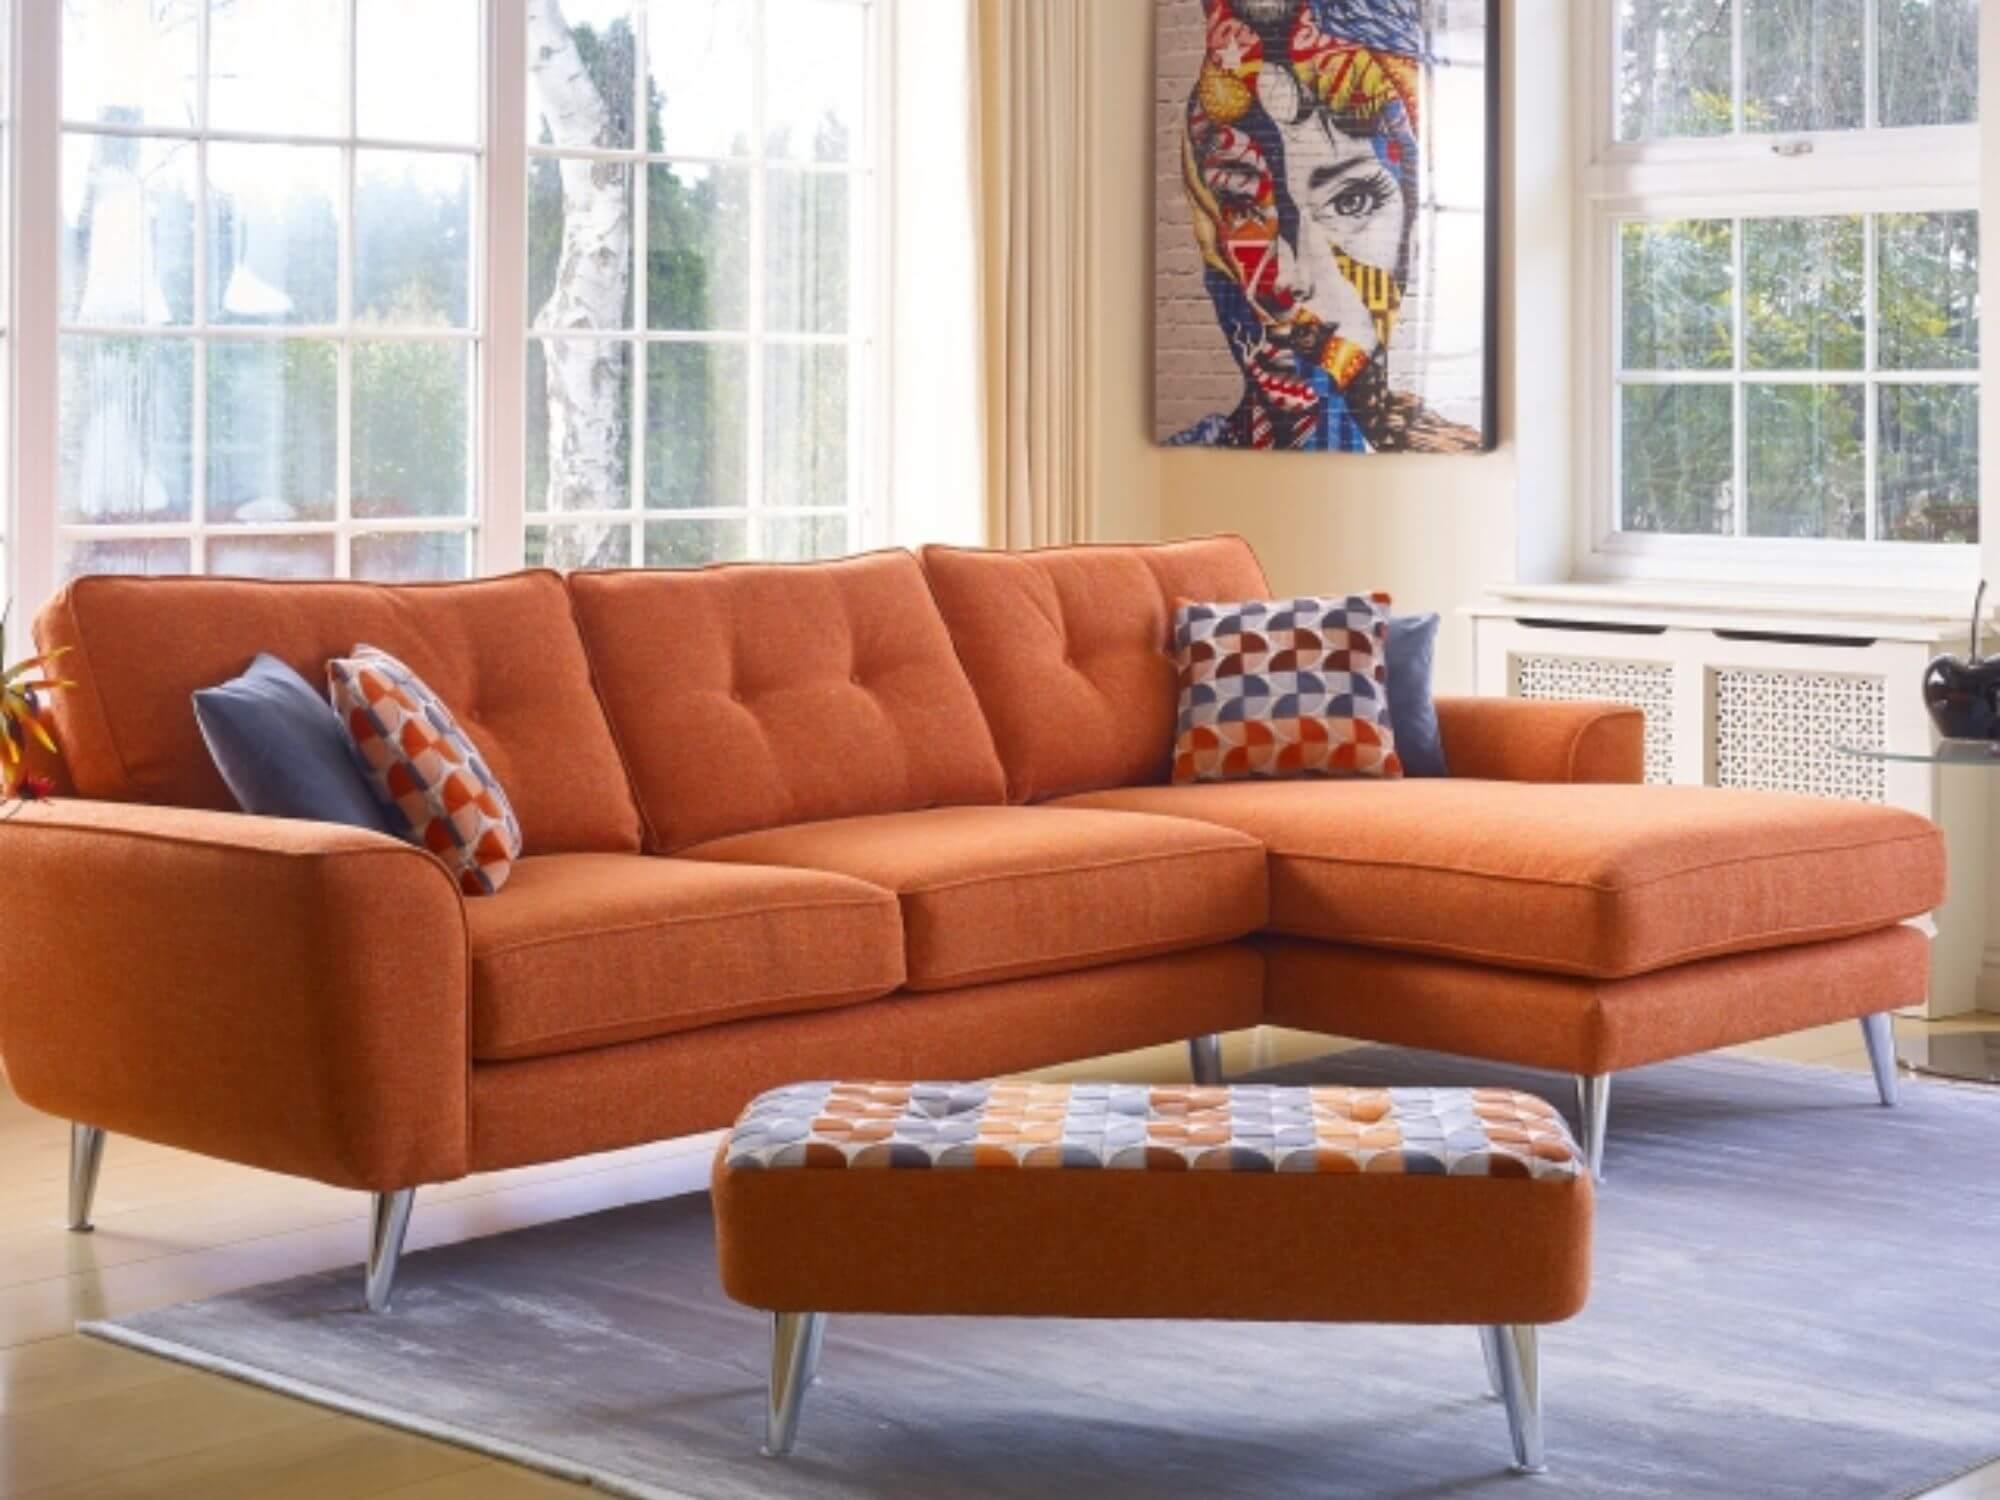 Malaga chaise sofa